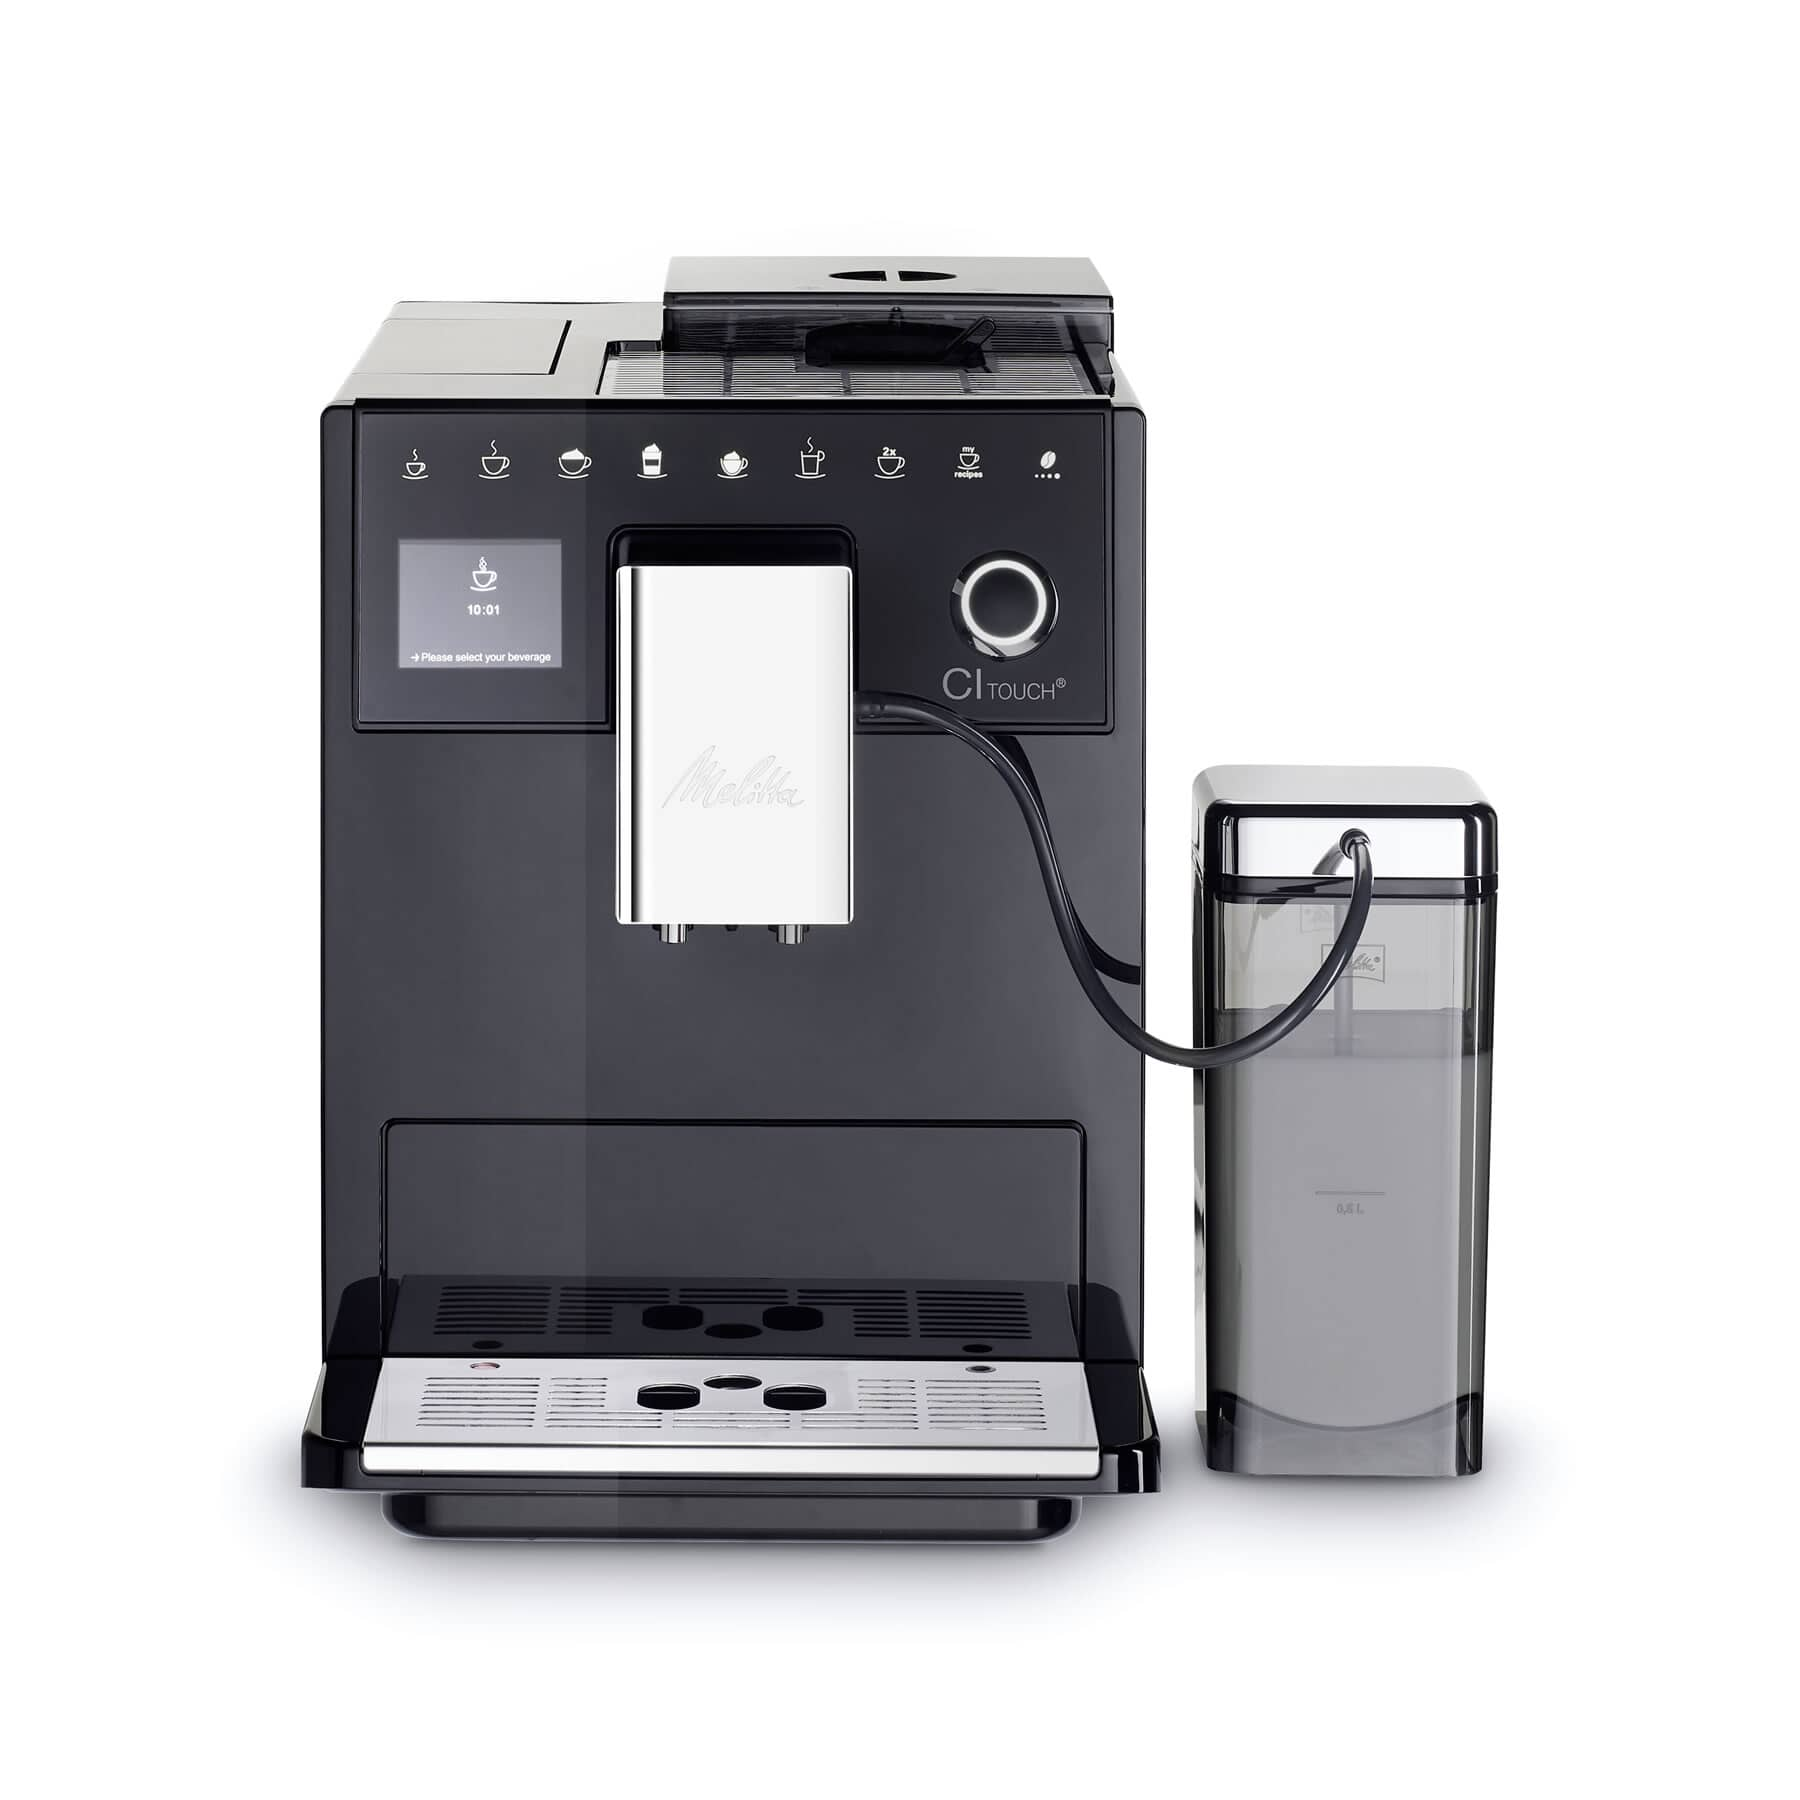 Melitta Caffeo Ci Touch Black Bean To Cup Coffee Machine F630 102